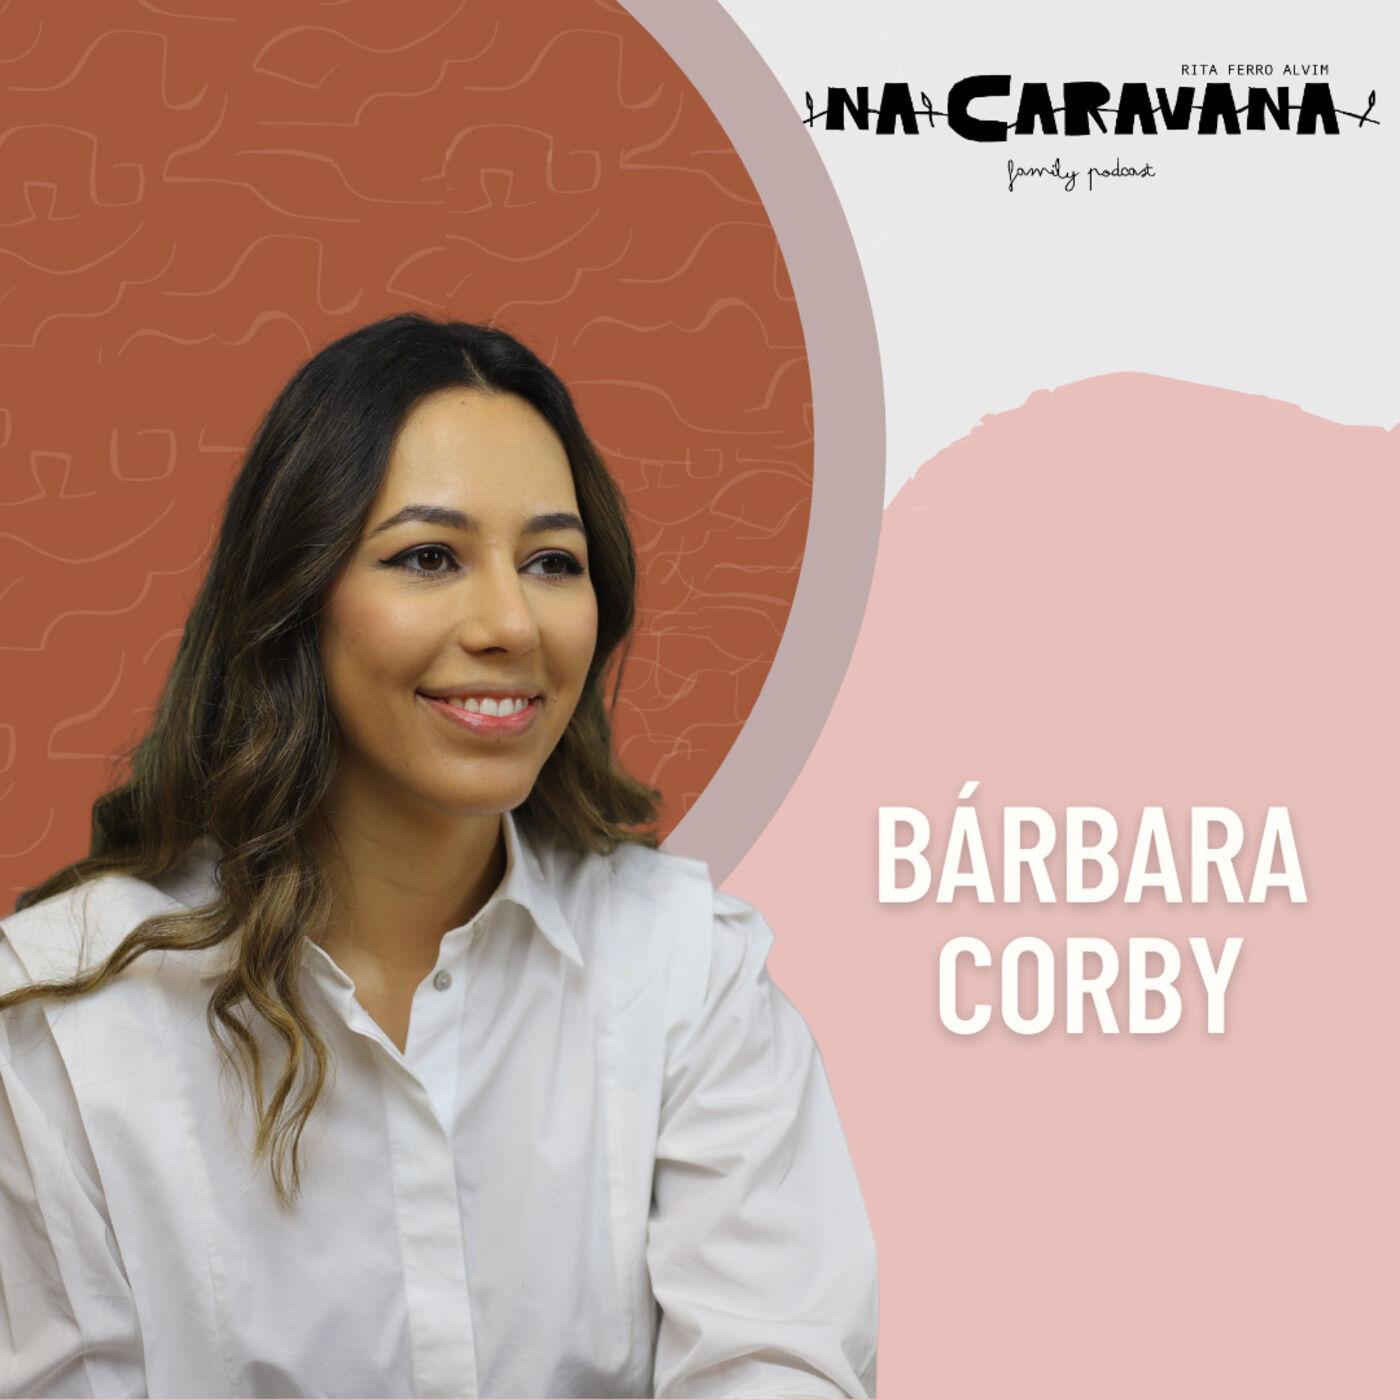 N'A Caravana com Bárbara Corby #78 Crescer no YouTube, terapia e ser mãe na pandemia